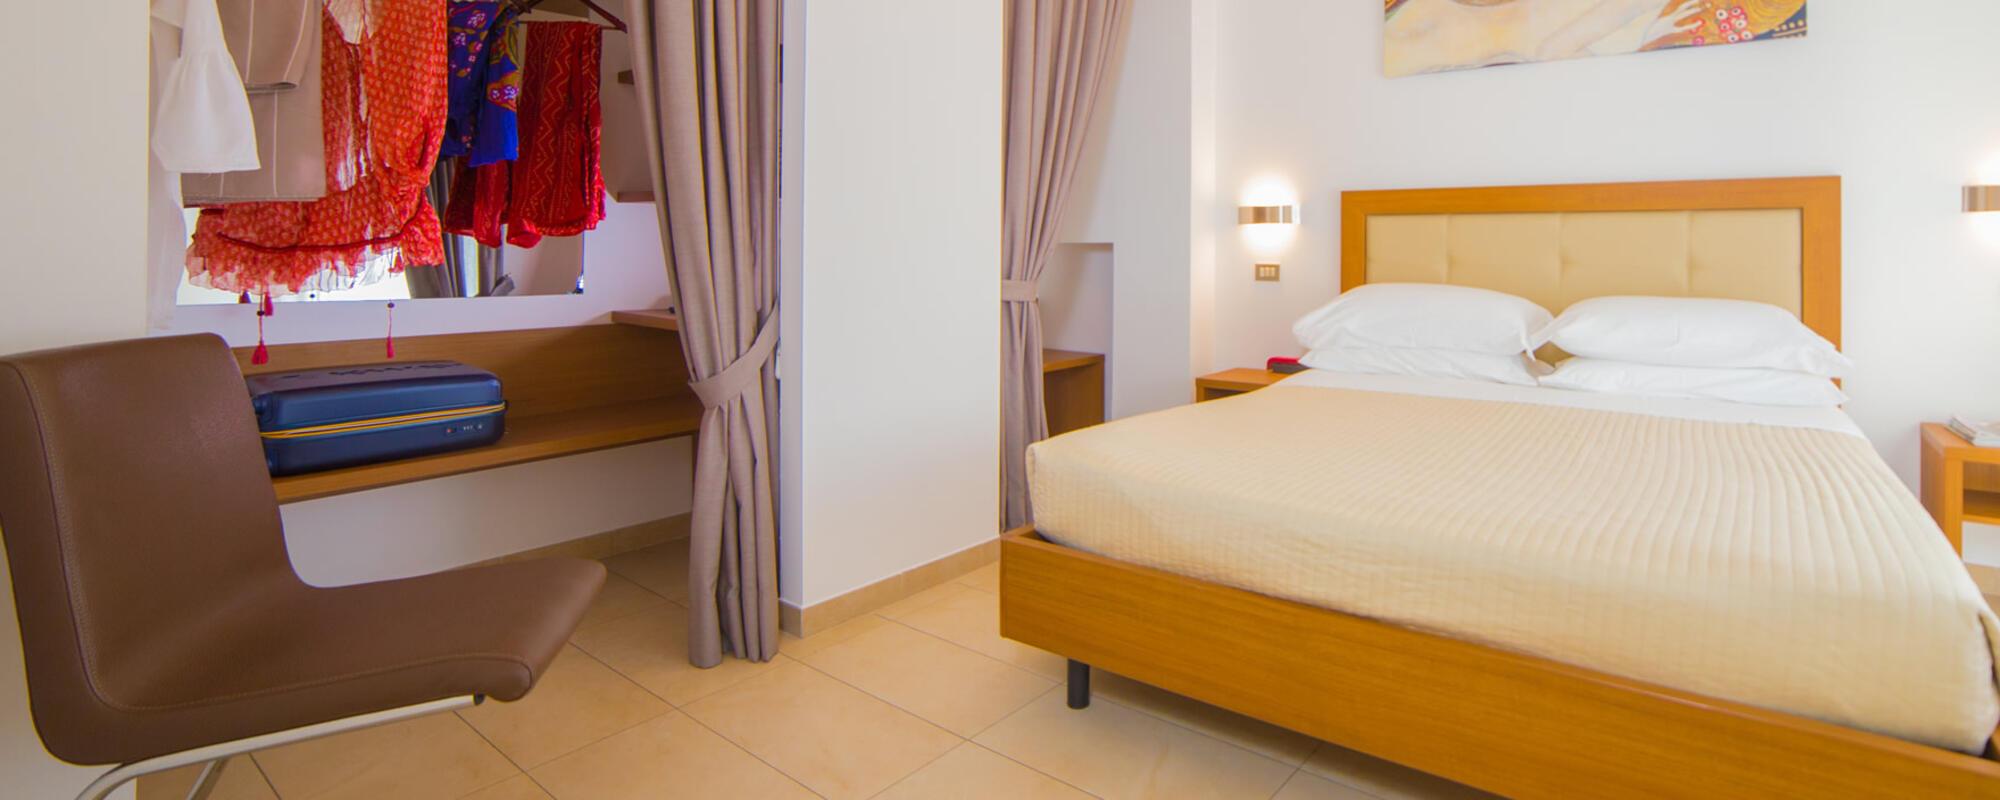 hotelmediterraneocattolica it home 014